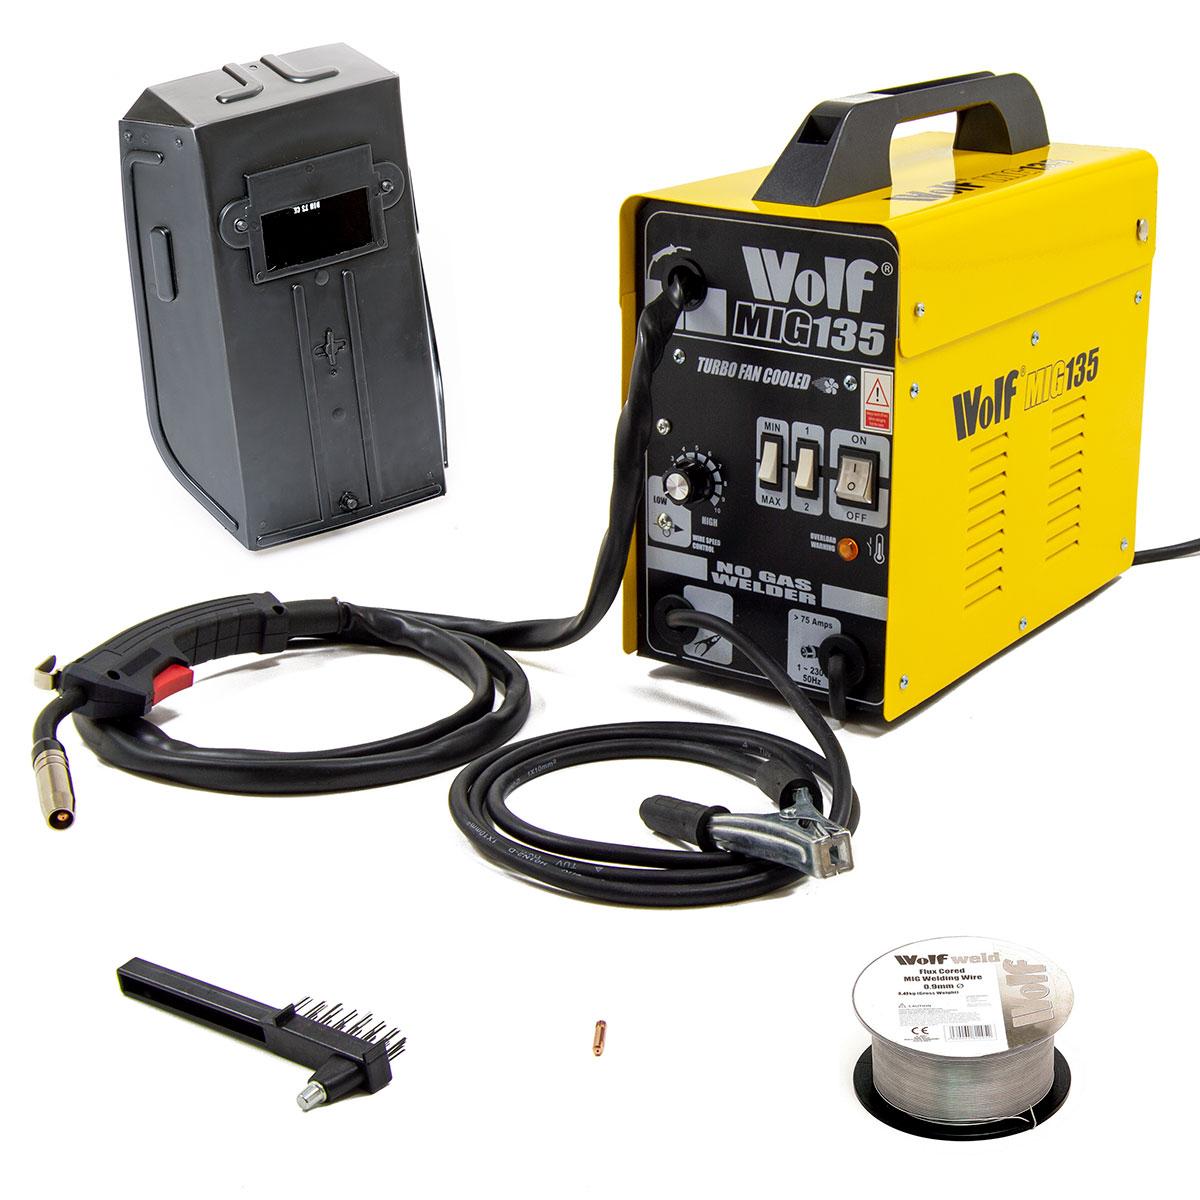 Mig Welder Parts Diagram Wolf Custom Wiring Century Model 20511 130 No Gas Ukhs Tv Tools To Go Rh Miller